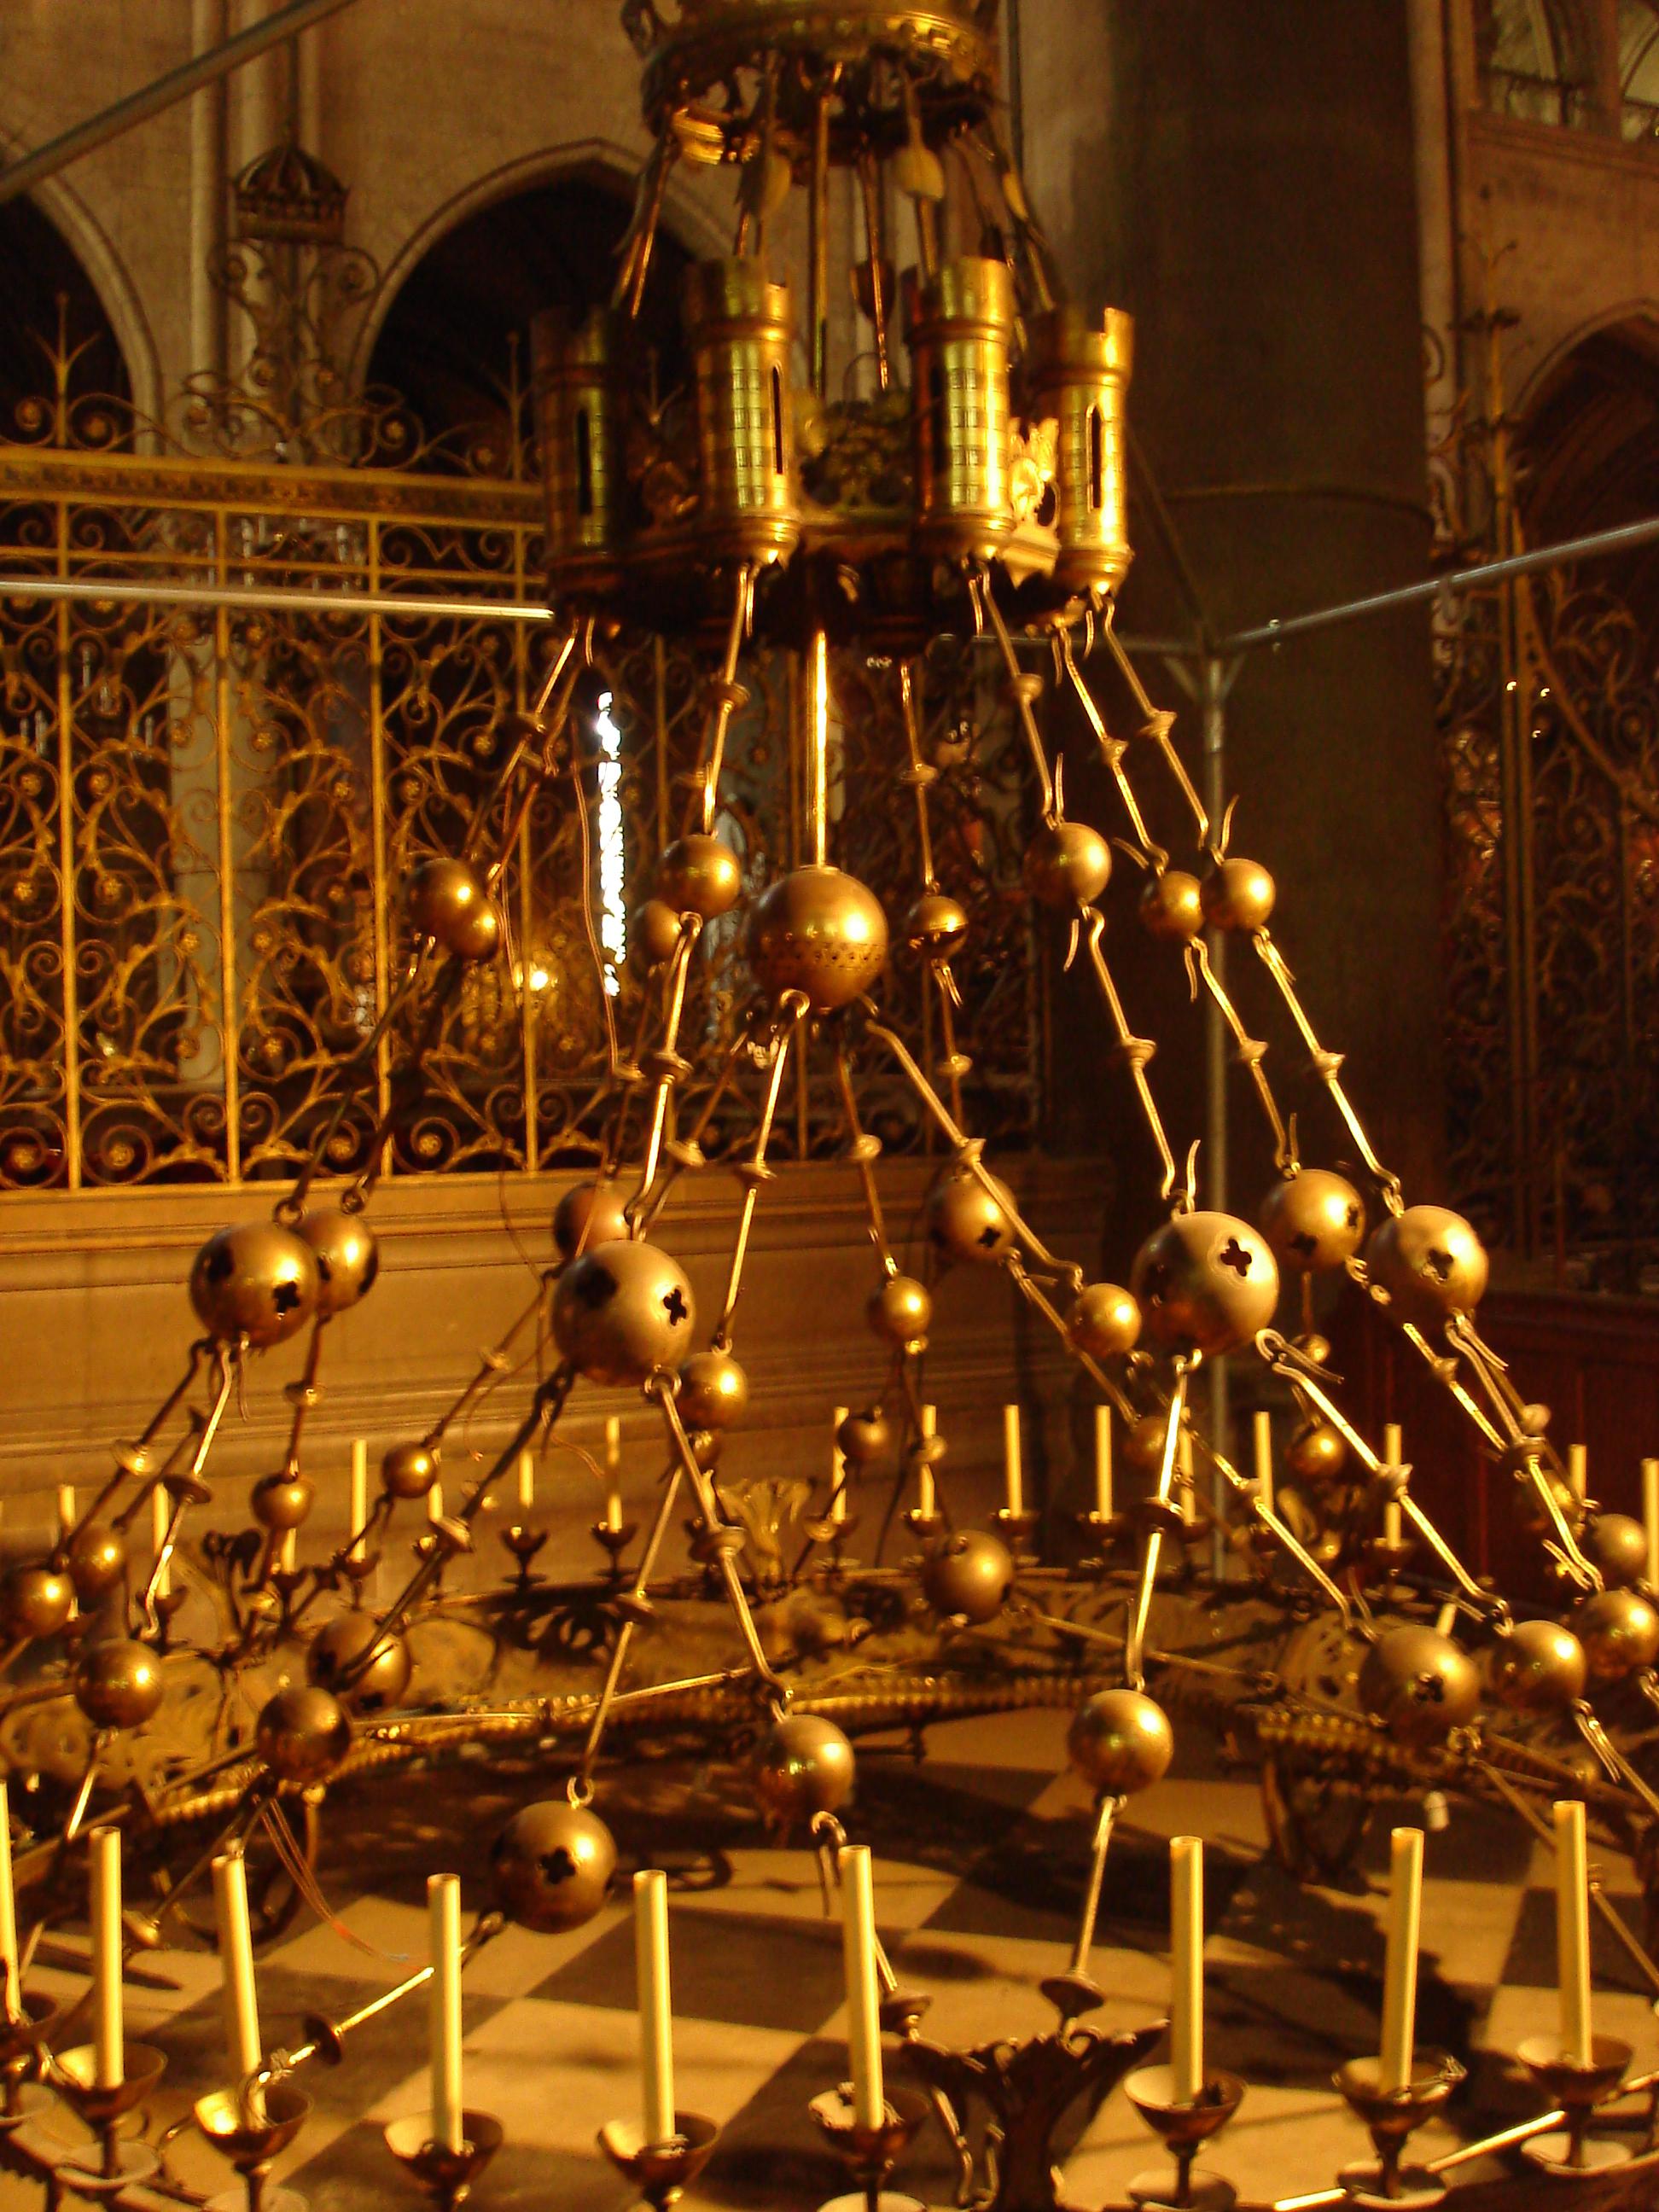 Fileparis notre dame cathedral interior corona chandelier 02g fileparis notre dame cathedral interior corona chandelier 02g mozeypictures Images